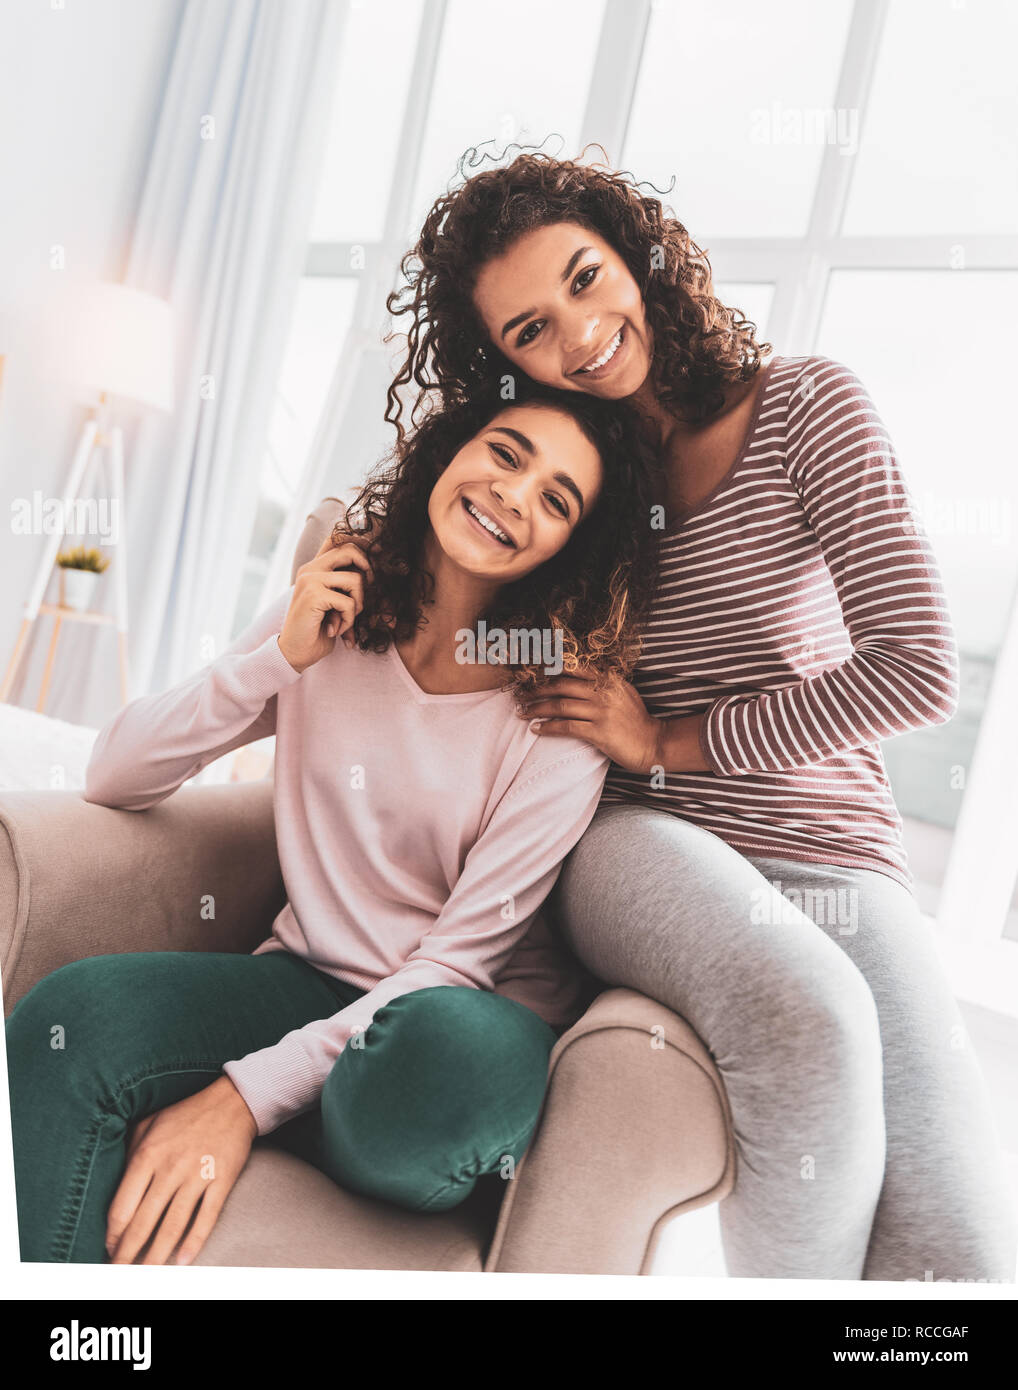 Smiling sister in grey leggings sitting near her older sister - Stock Image